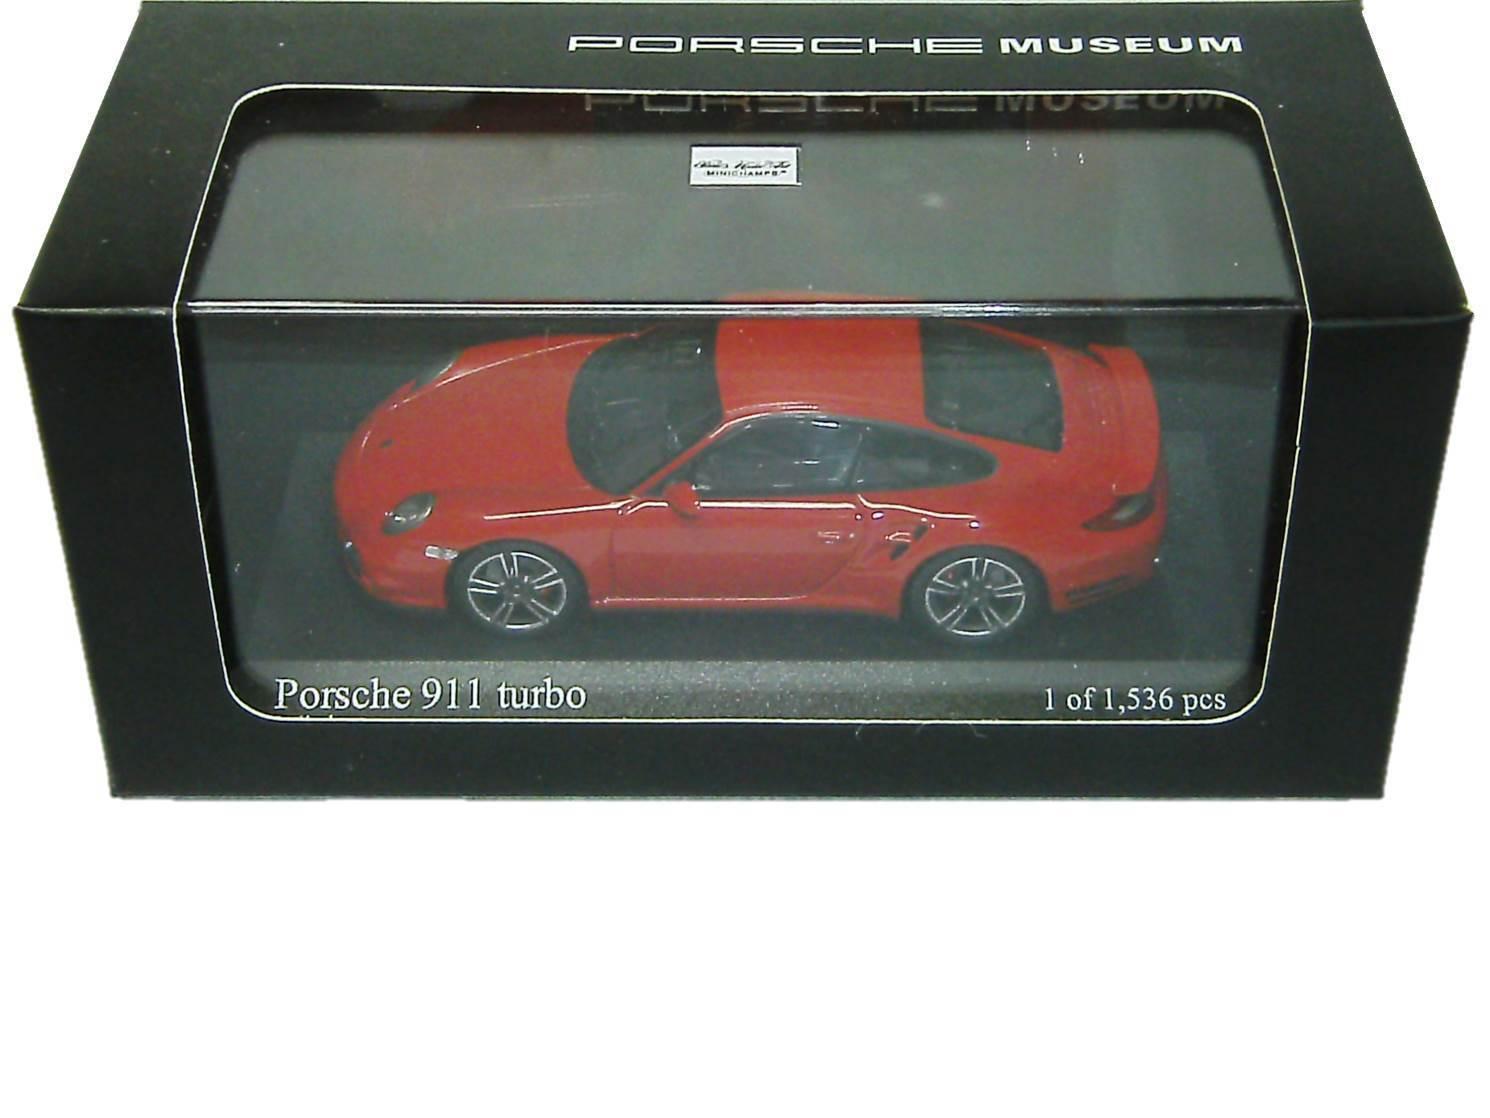 Porsche Porsche Porsche 911 turbo rojo teja museo Edition Minichamps 1 43 map02036514 nuevo 9bd251